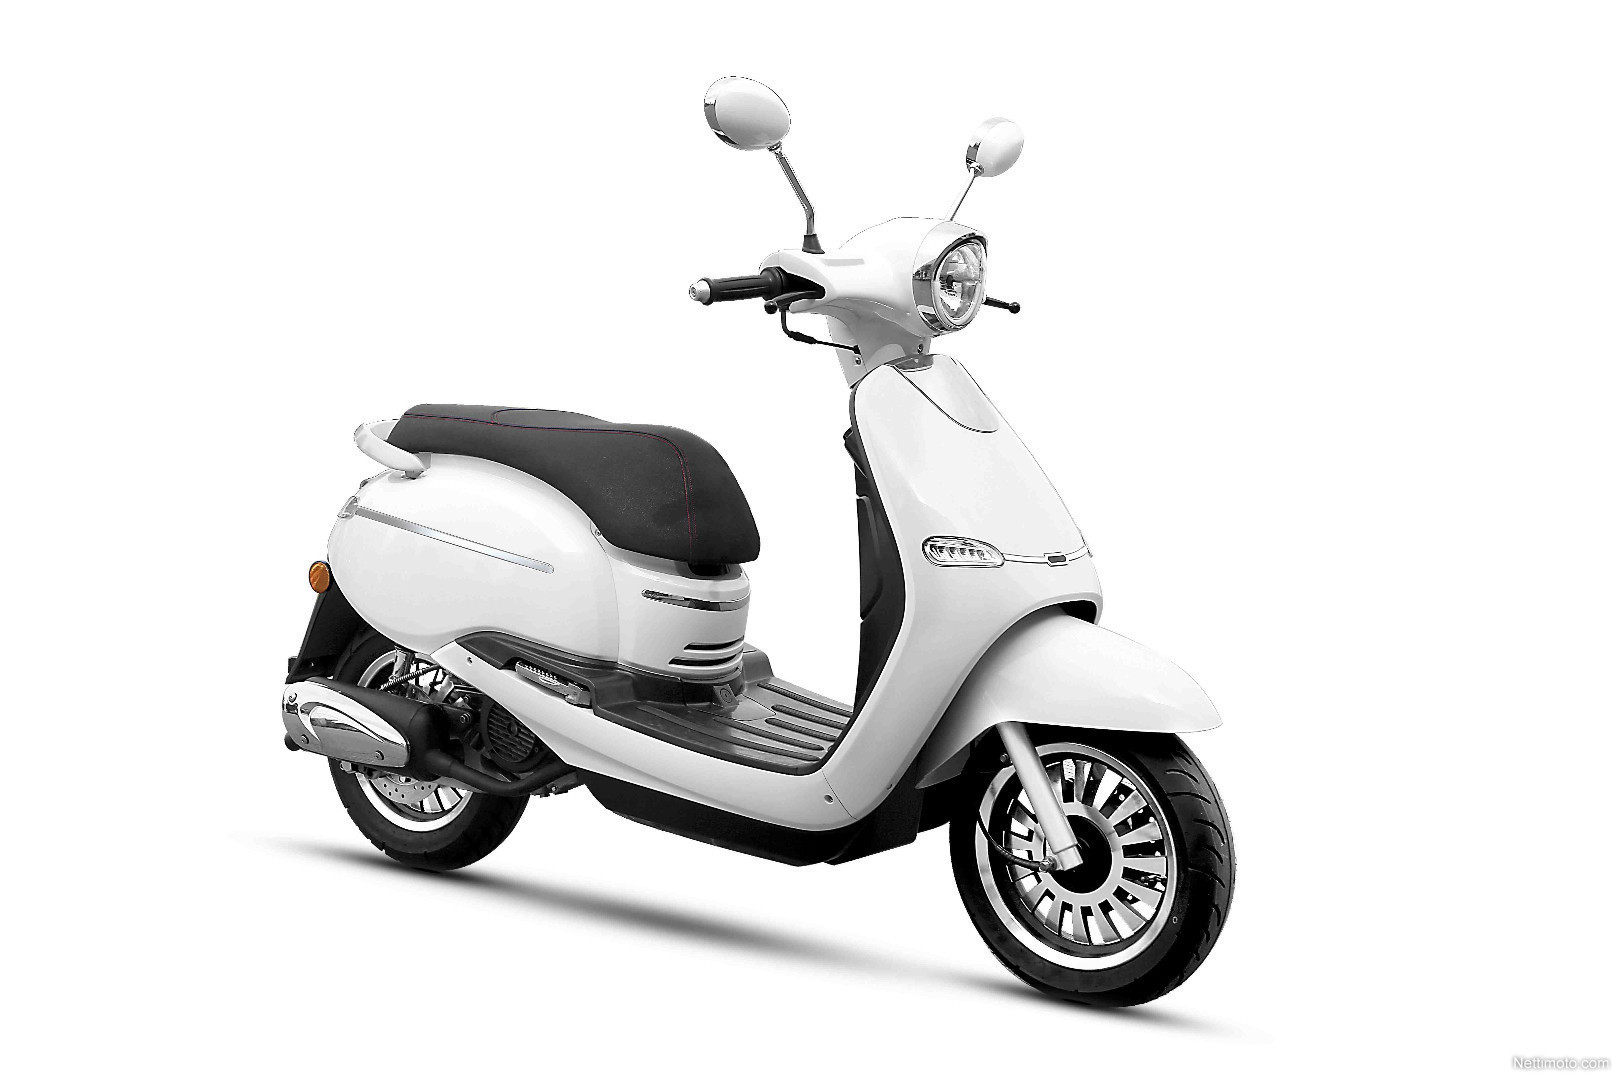 Znen ZN50QT ZN50QT-Y Cruise 50 cm³ 2018 - Salo - Moped